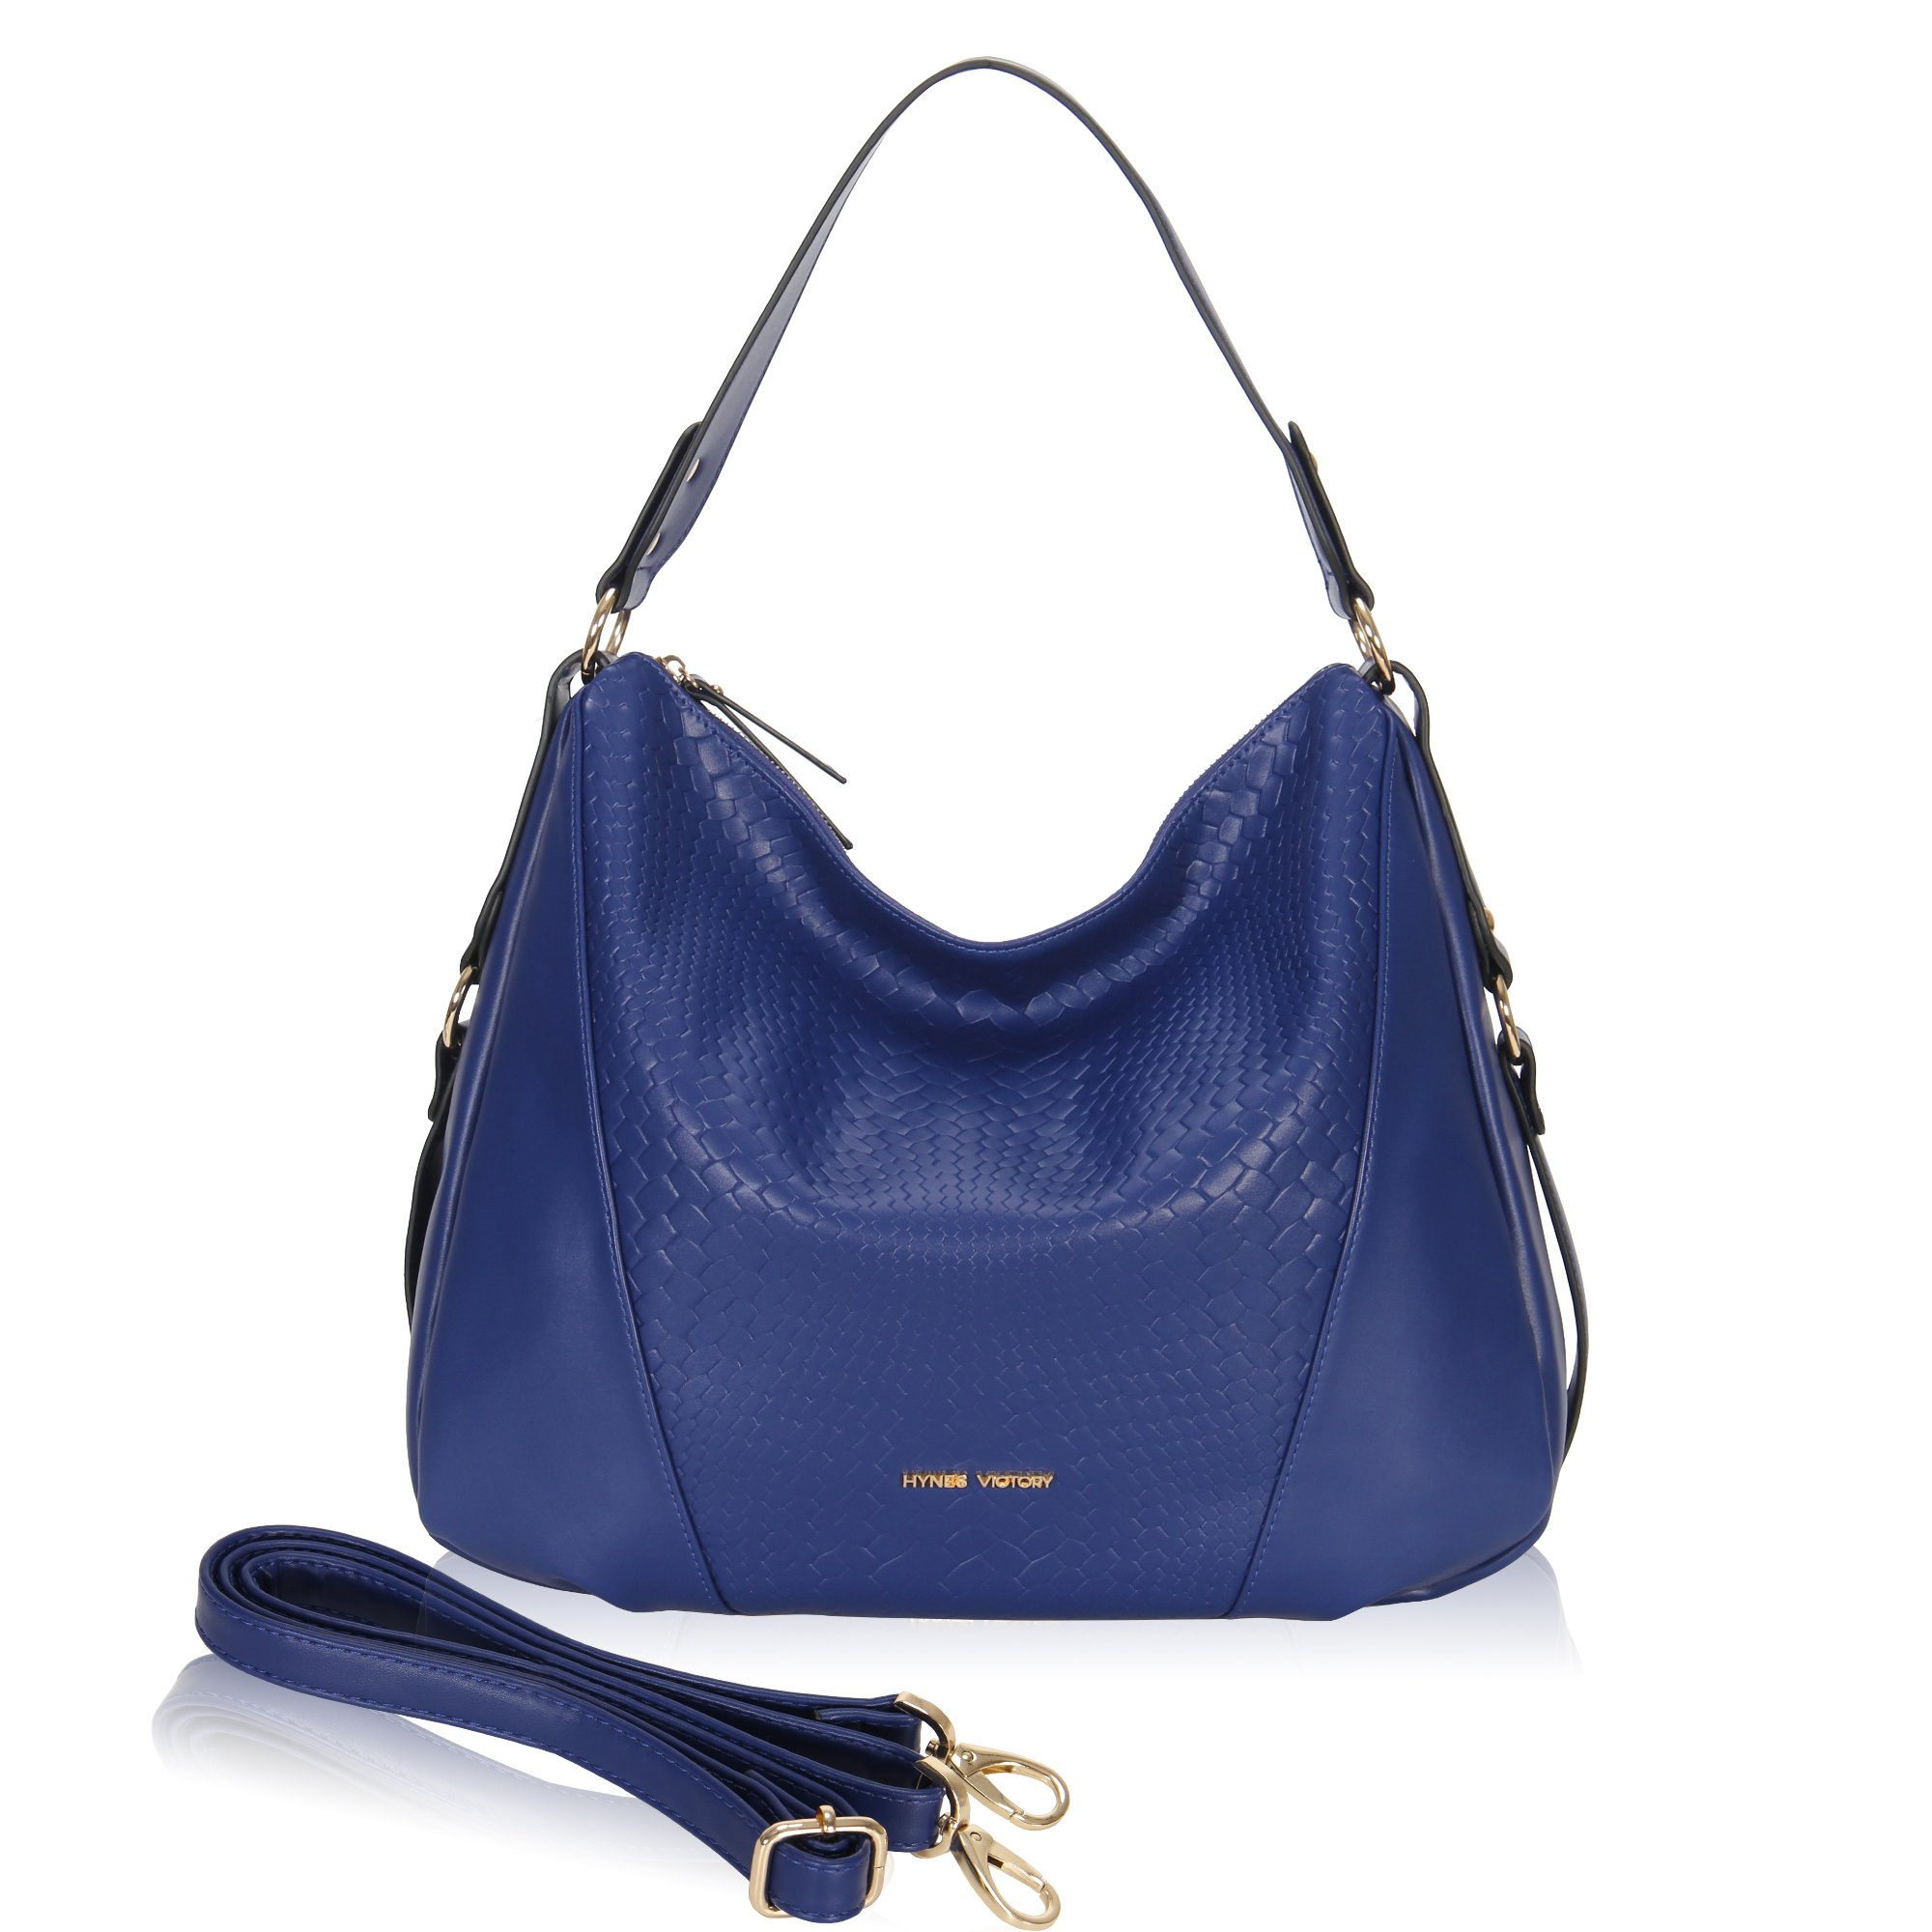 Hynes Victory Woven Pattern Hobo Bag Stylish Hobo Crossbody Bag for Lady Woman Purse Blue